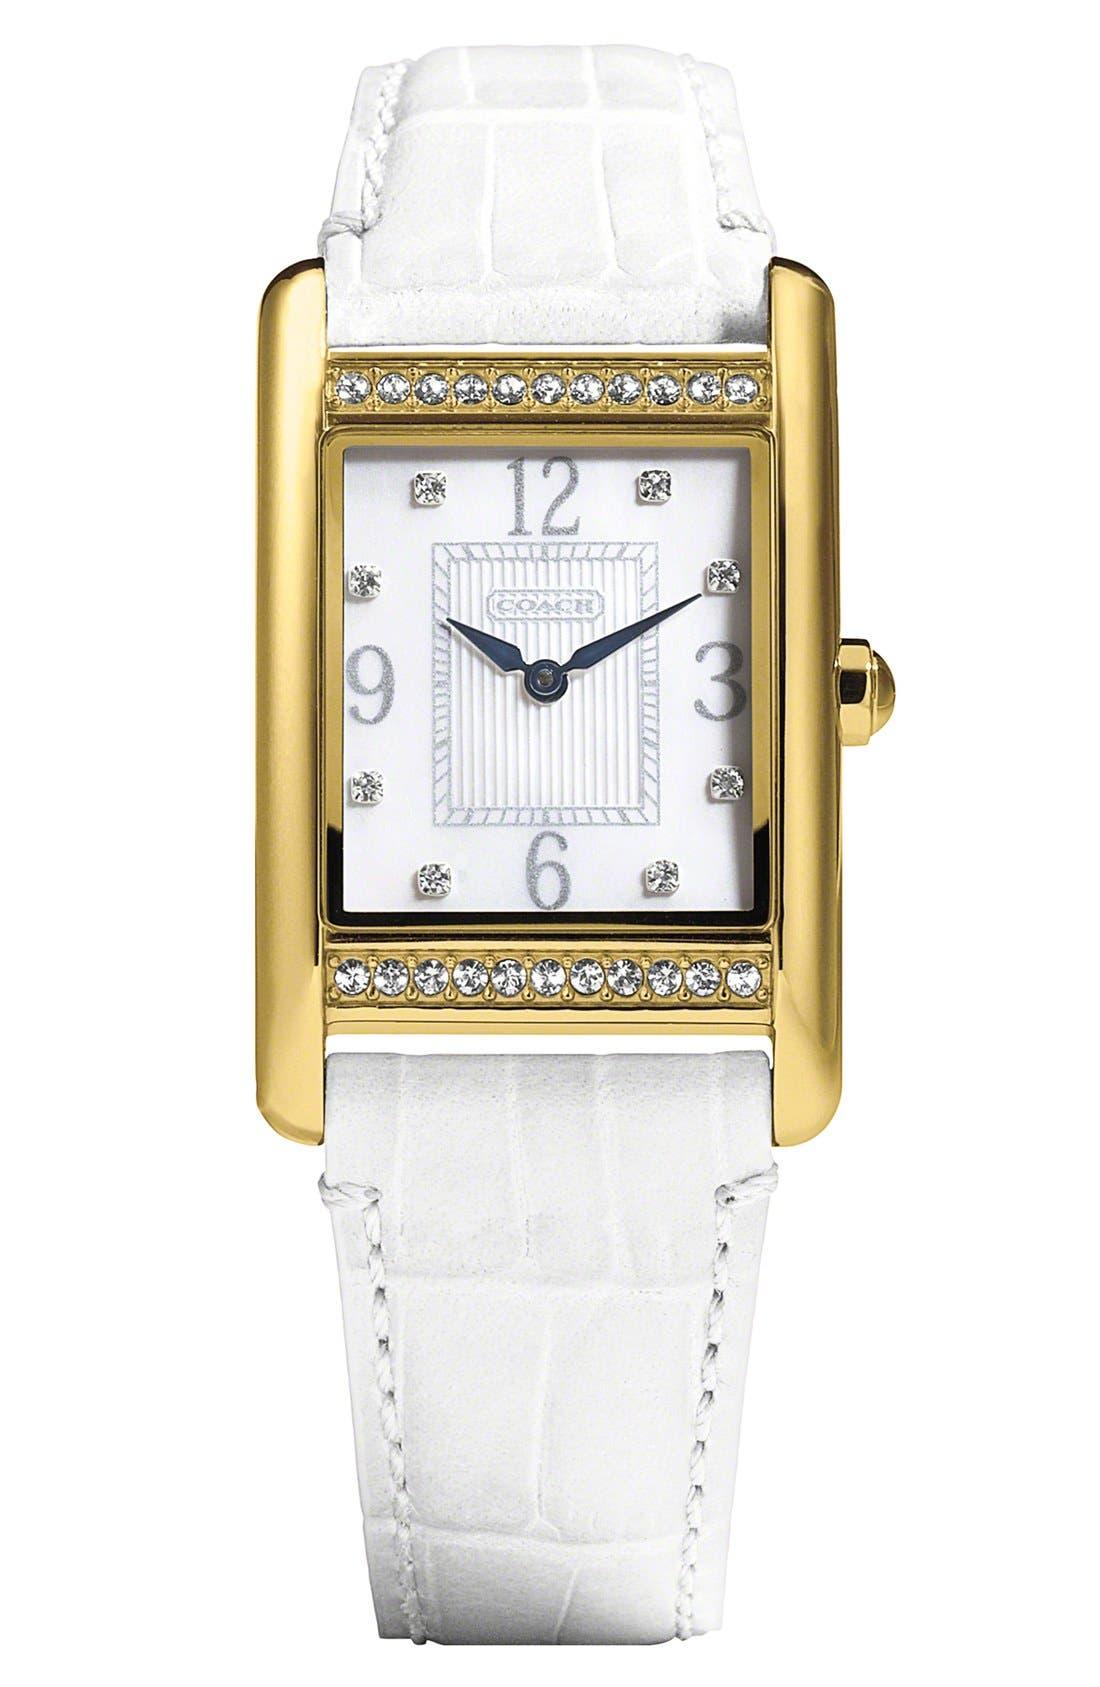 Main Image - COACH 'Lexington' Crystal Bezel Watch, 25mm x 30mm